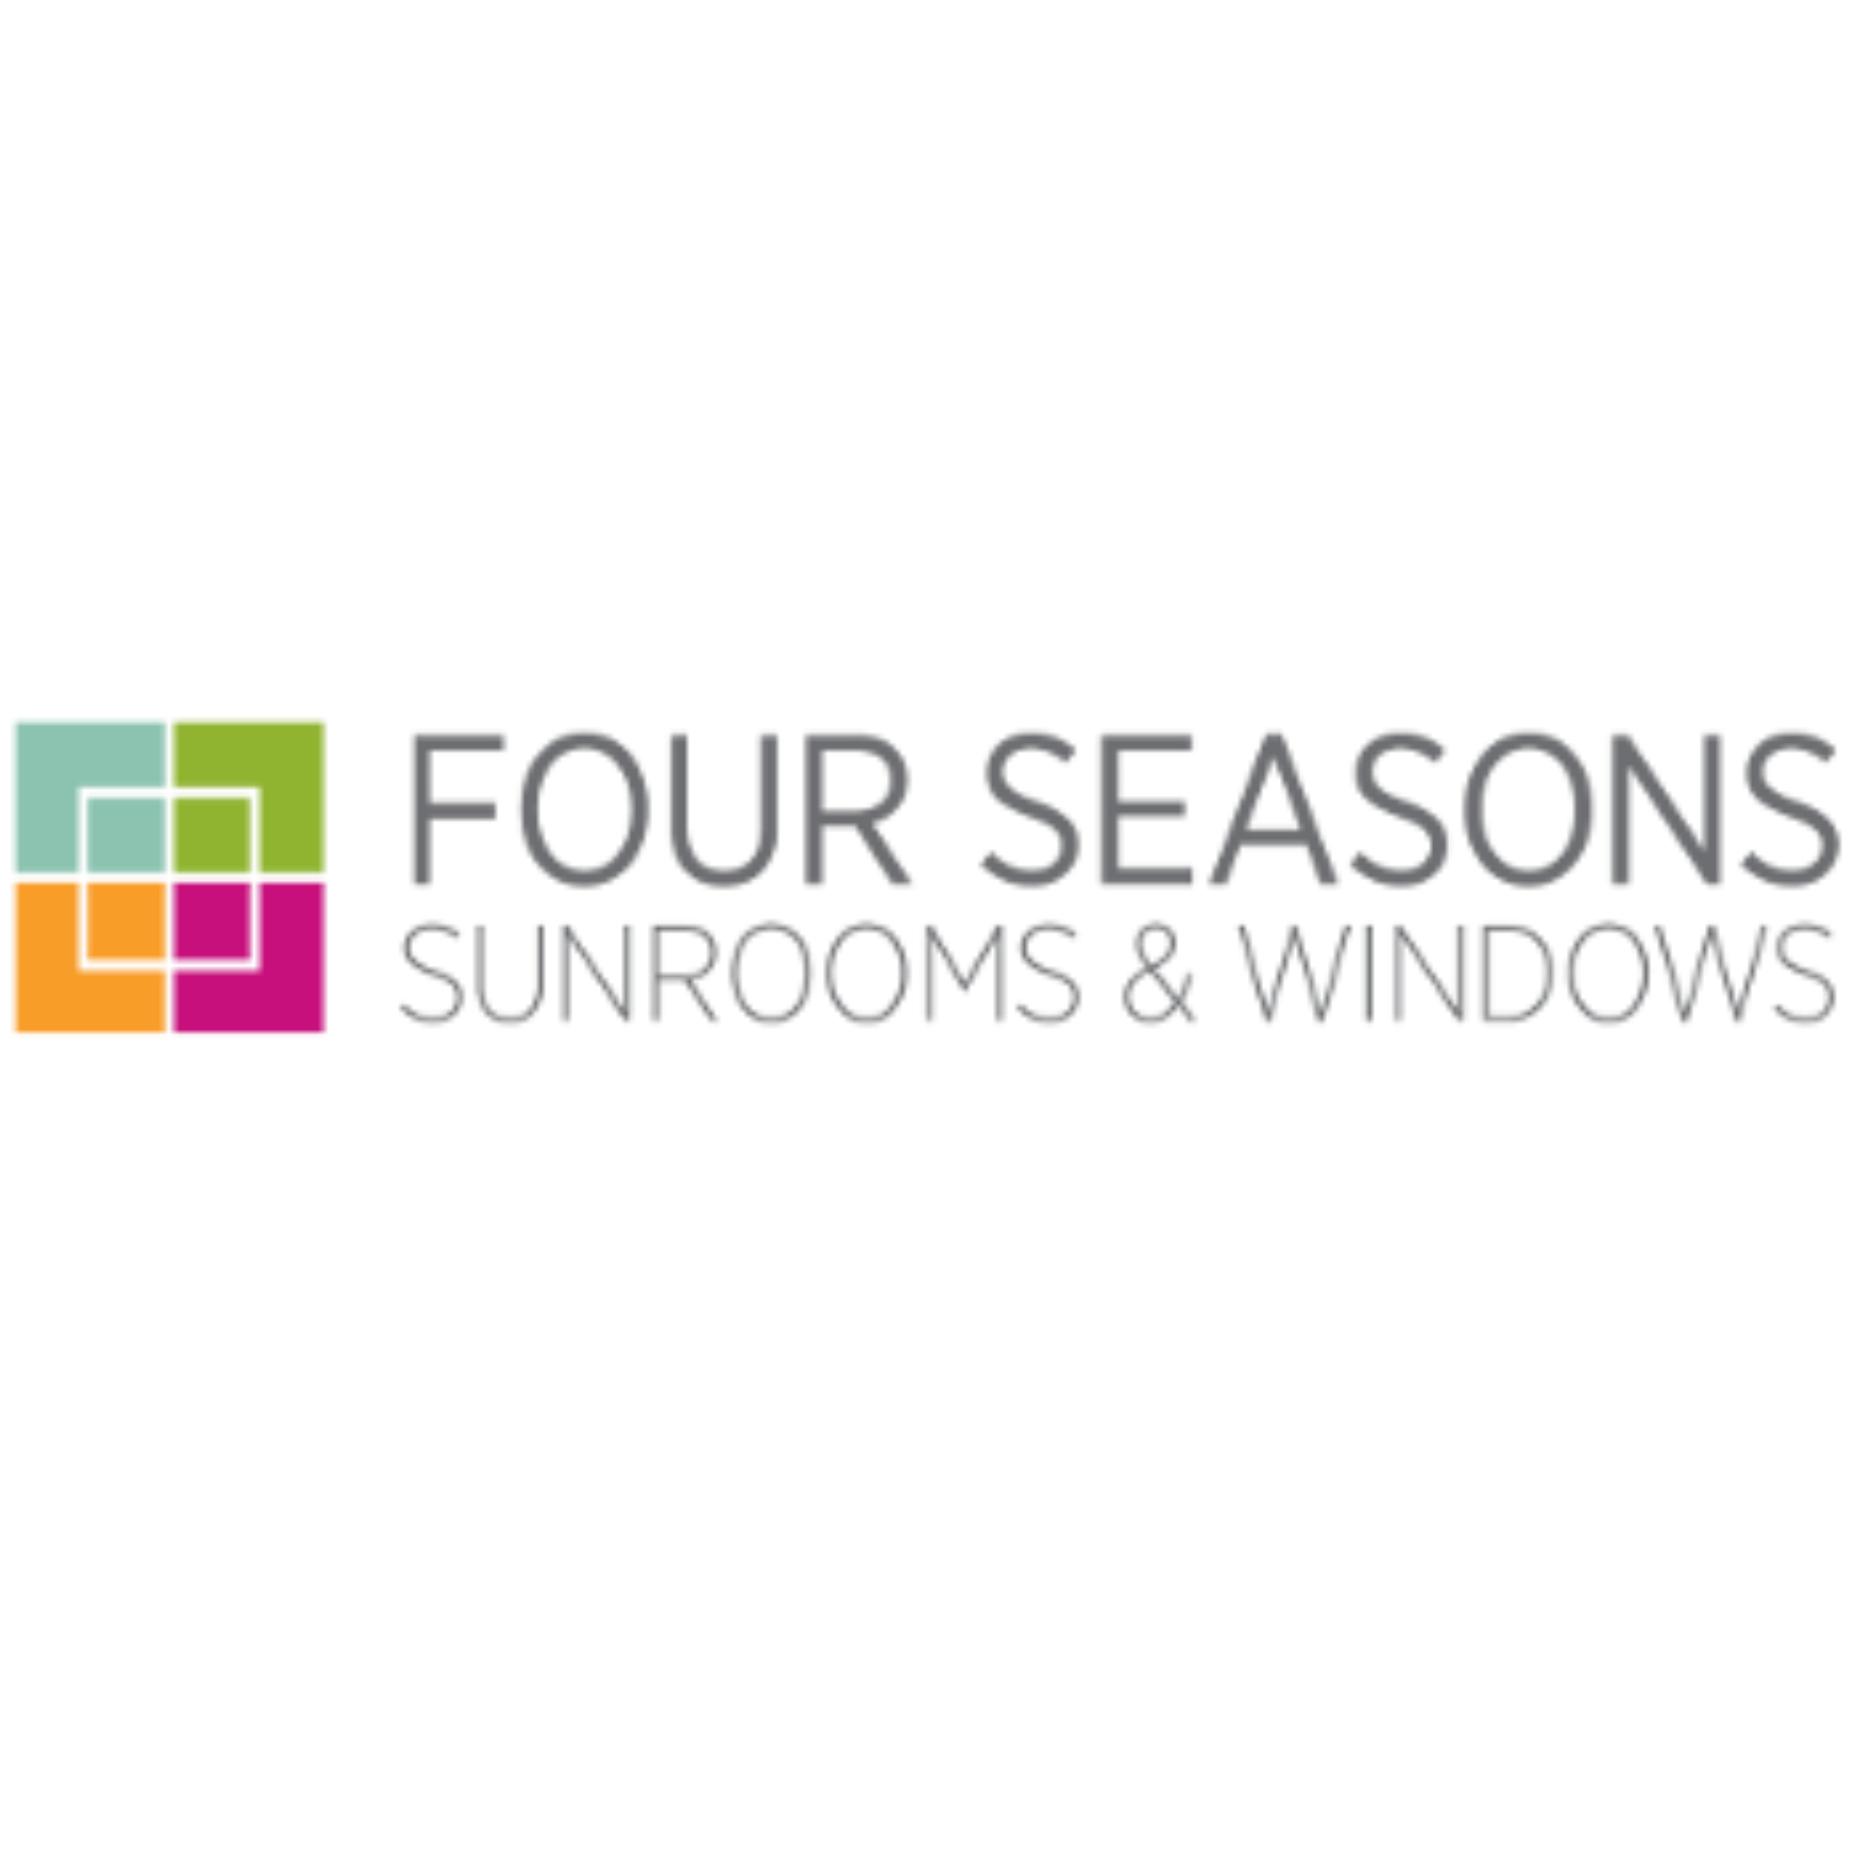 Four Seasons Sunrooms